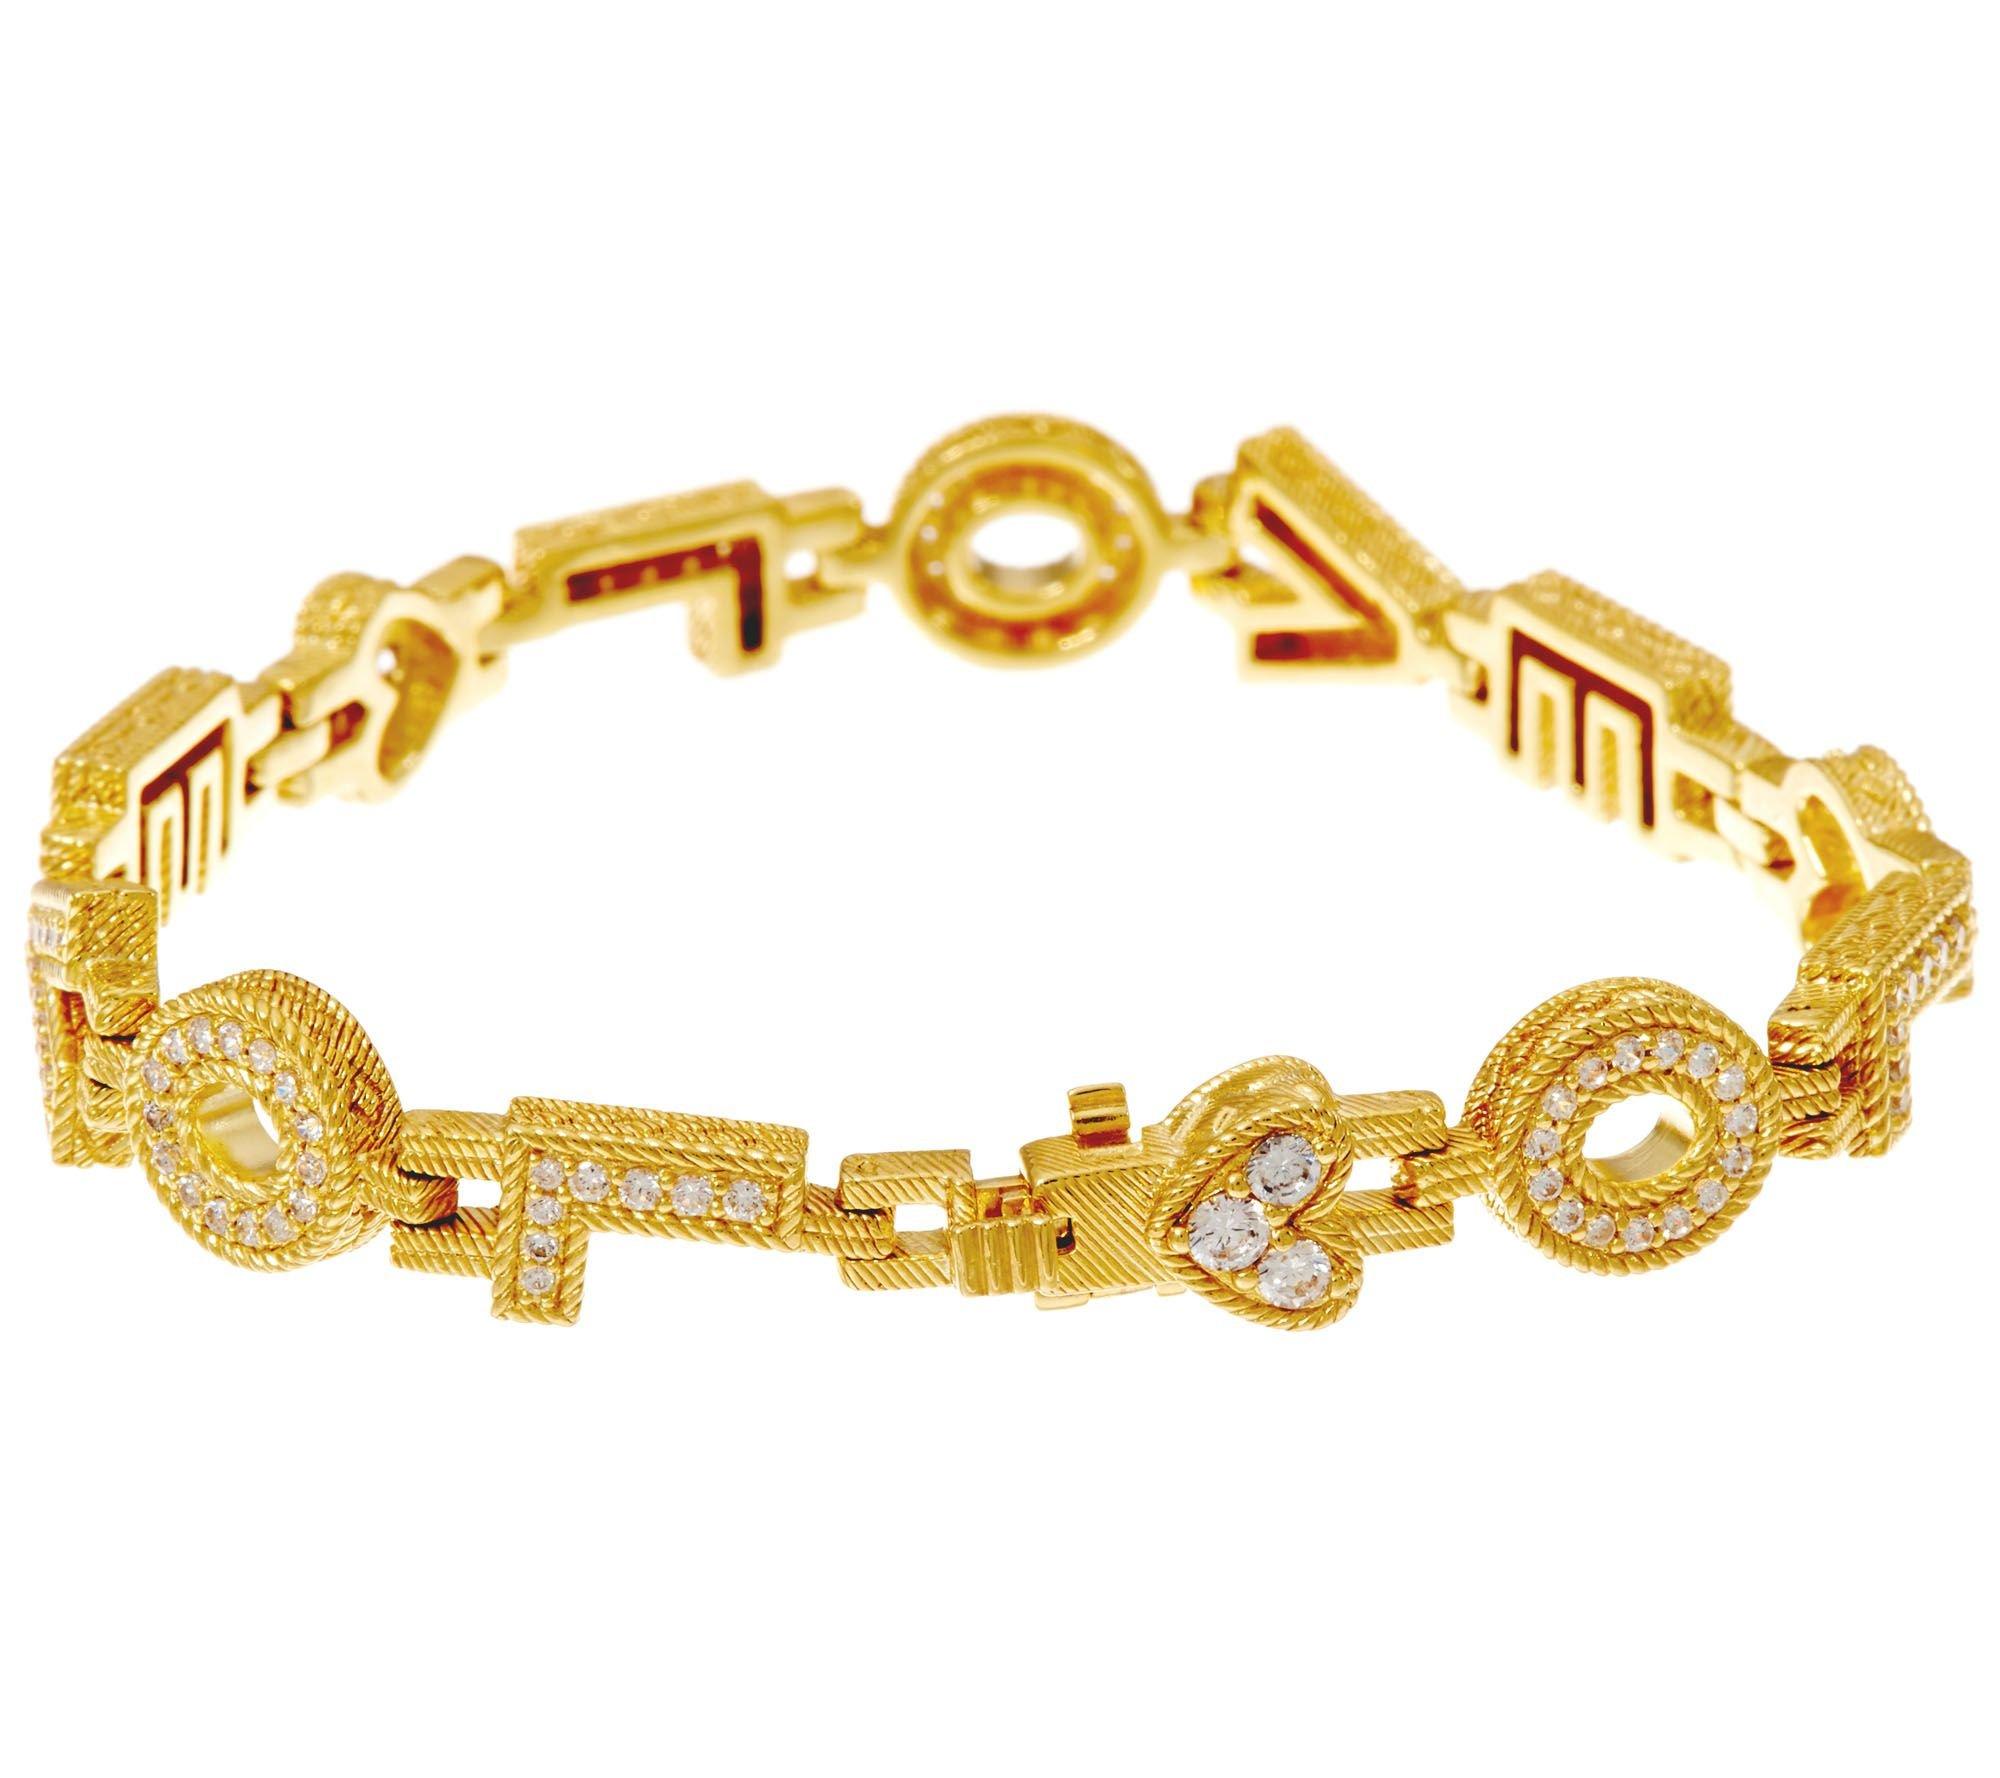 Silvostyles 1.70 Carat D/VVS1 Diamond Love Design Link Bracelet In 14K Yellow Gold Plated by Silvostyles